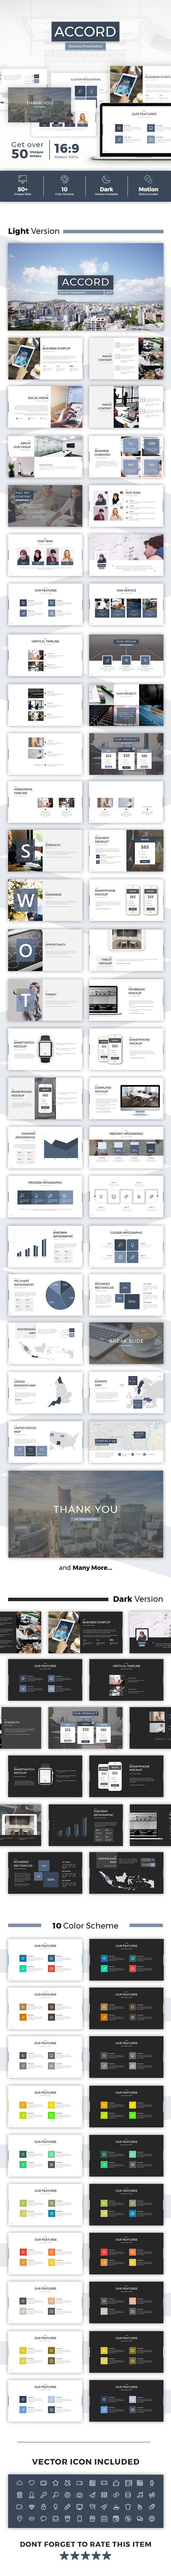 Accord  Business Presentation  Business Presentation Business